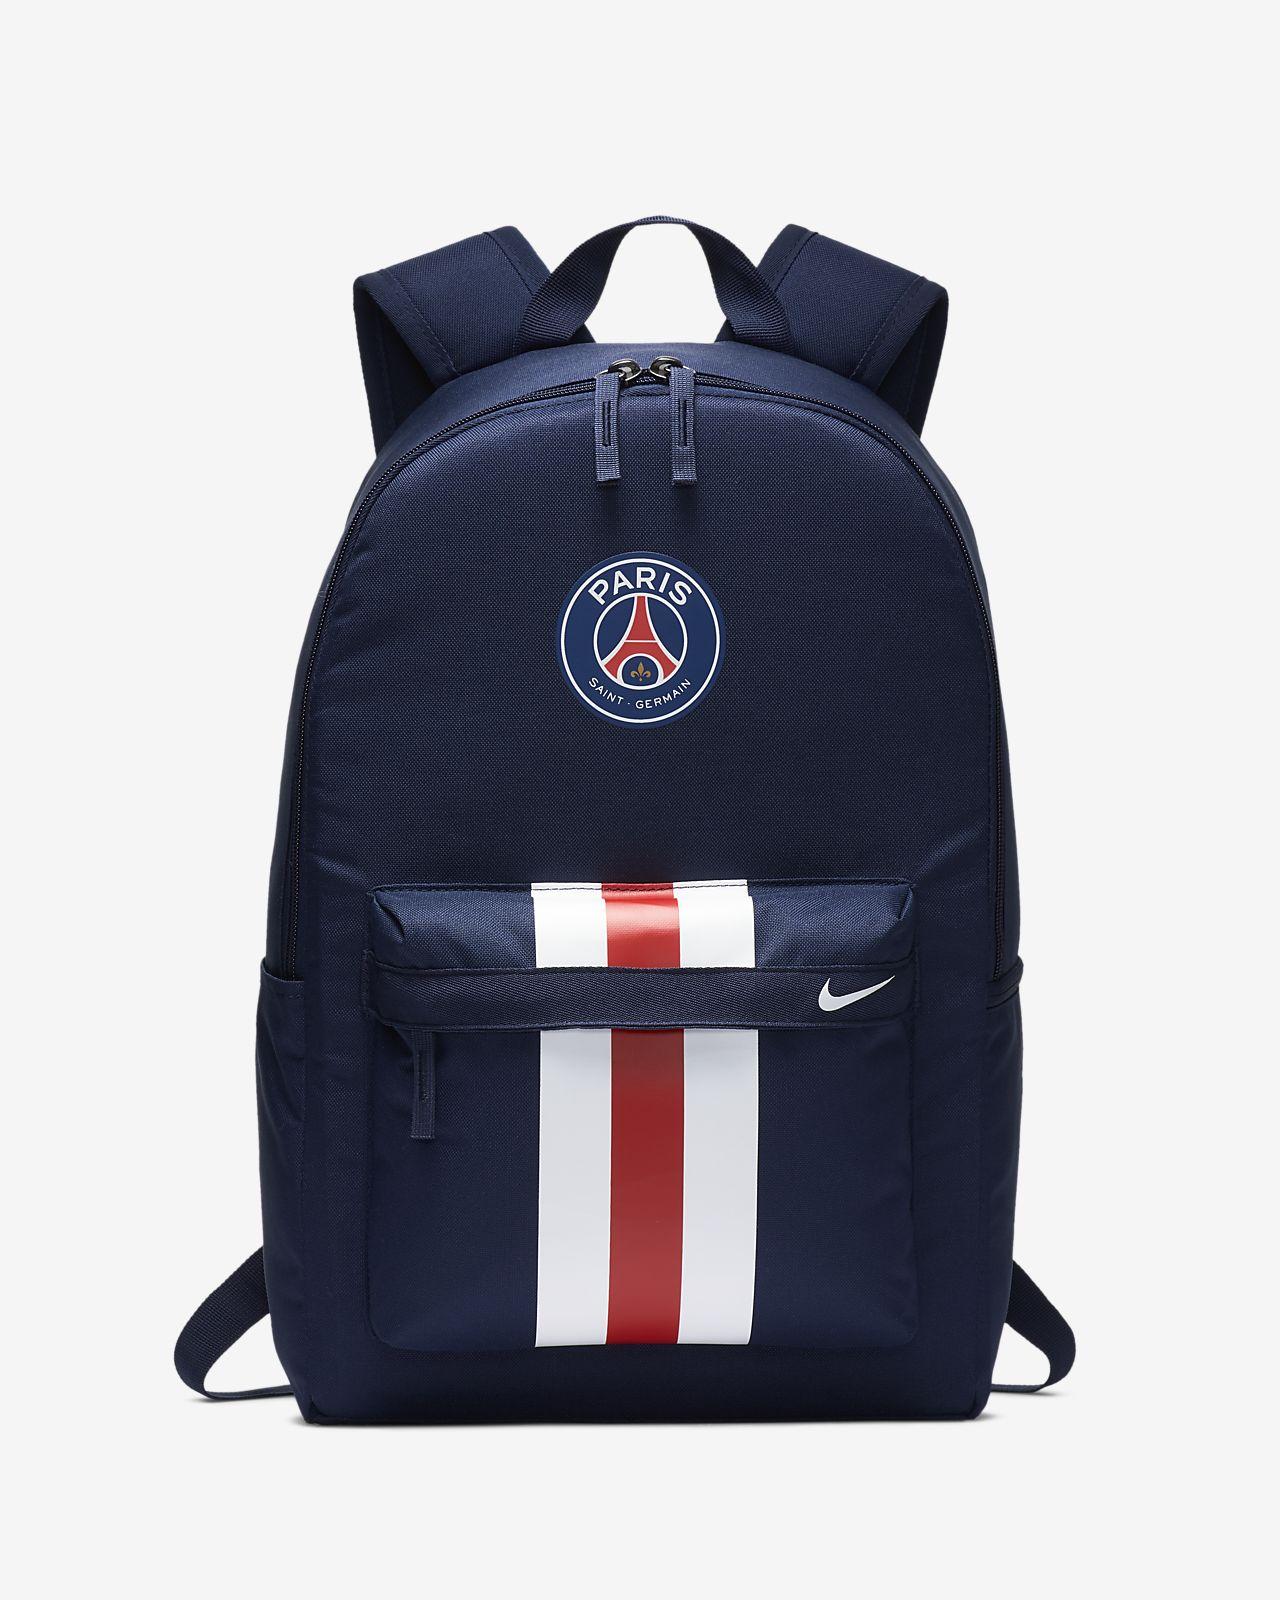 Paris Saint-Germain Stadium Fußballrucksack